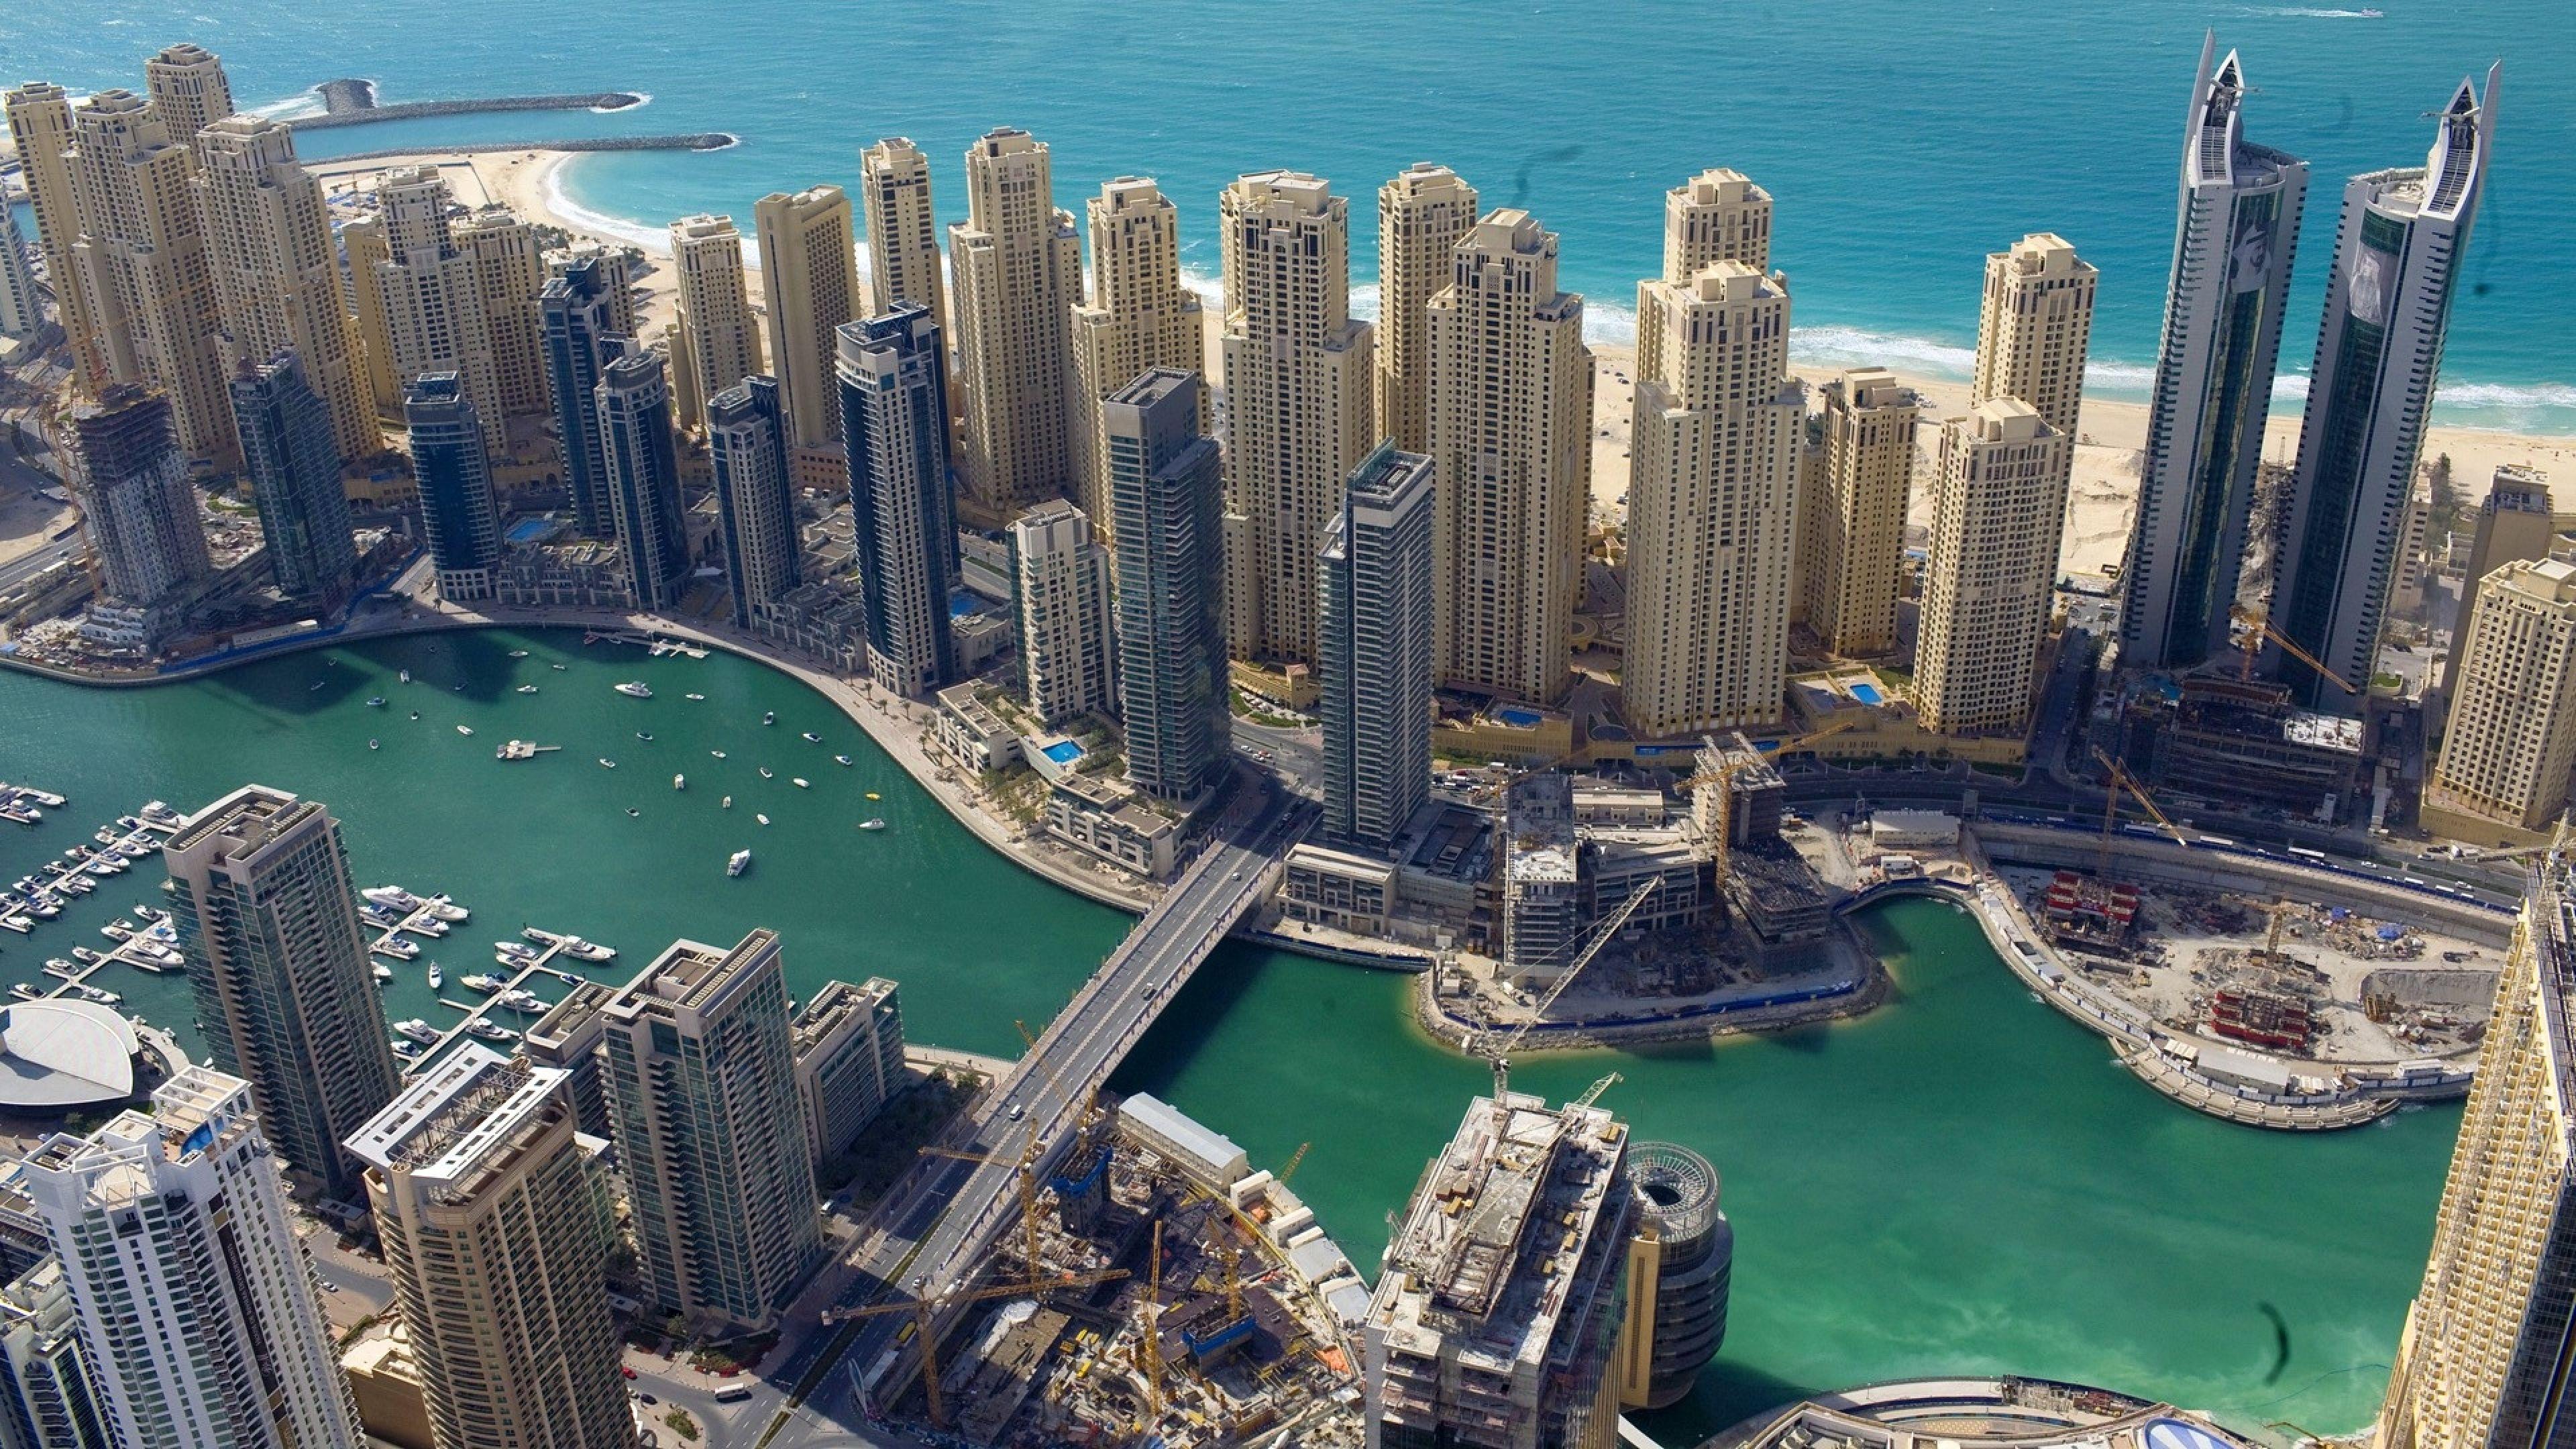 Dubai Birdge and Buildings 4K Wallpaper